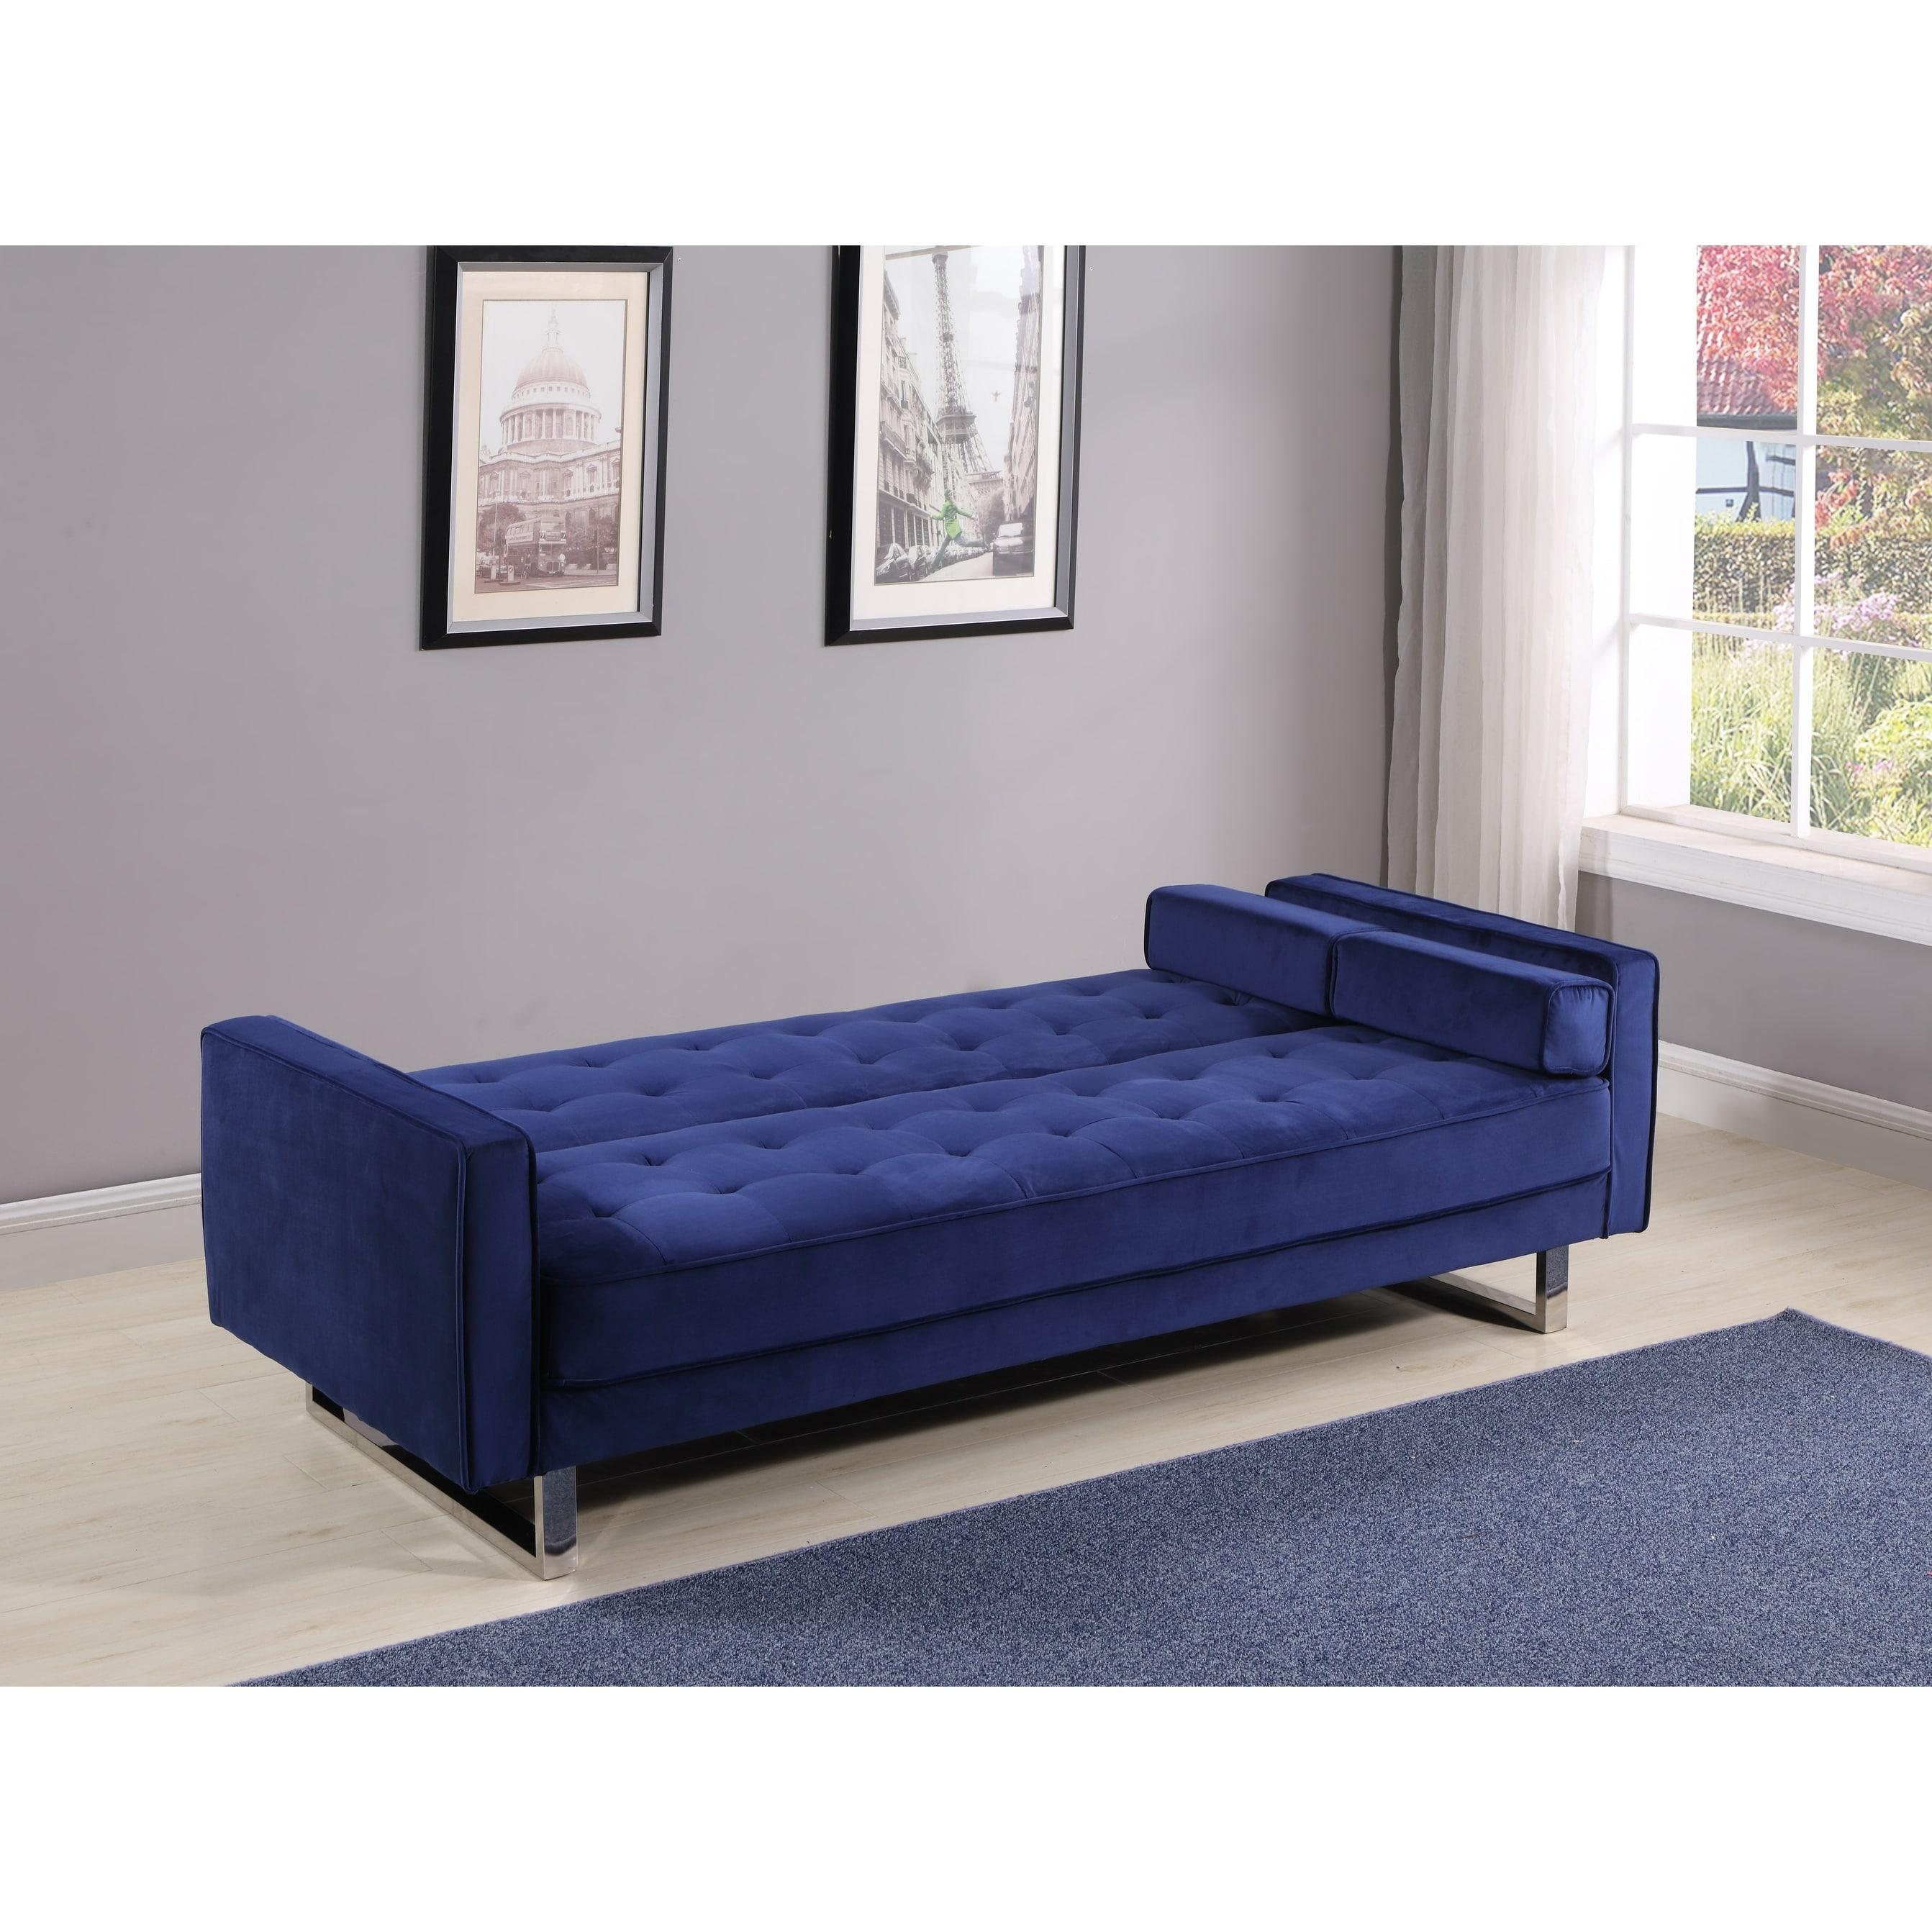 Enjoyable Best Quality Furniture Velvet Tufted Click Clack Sofa Bed Pdpeps Interior Chair Design Pdpepsorg